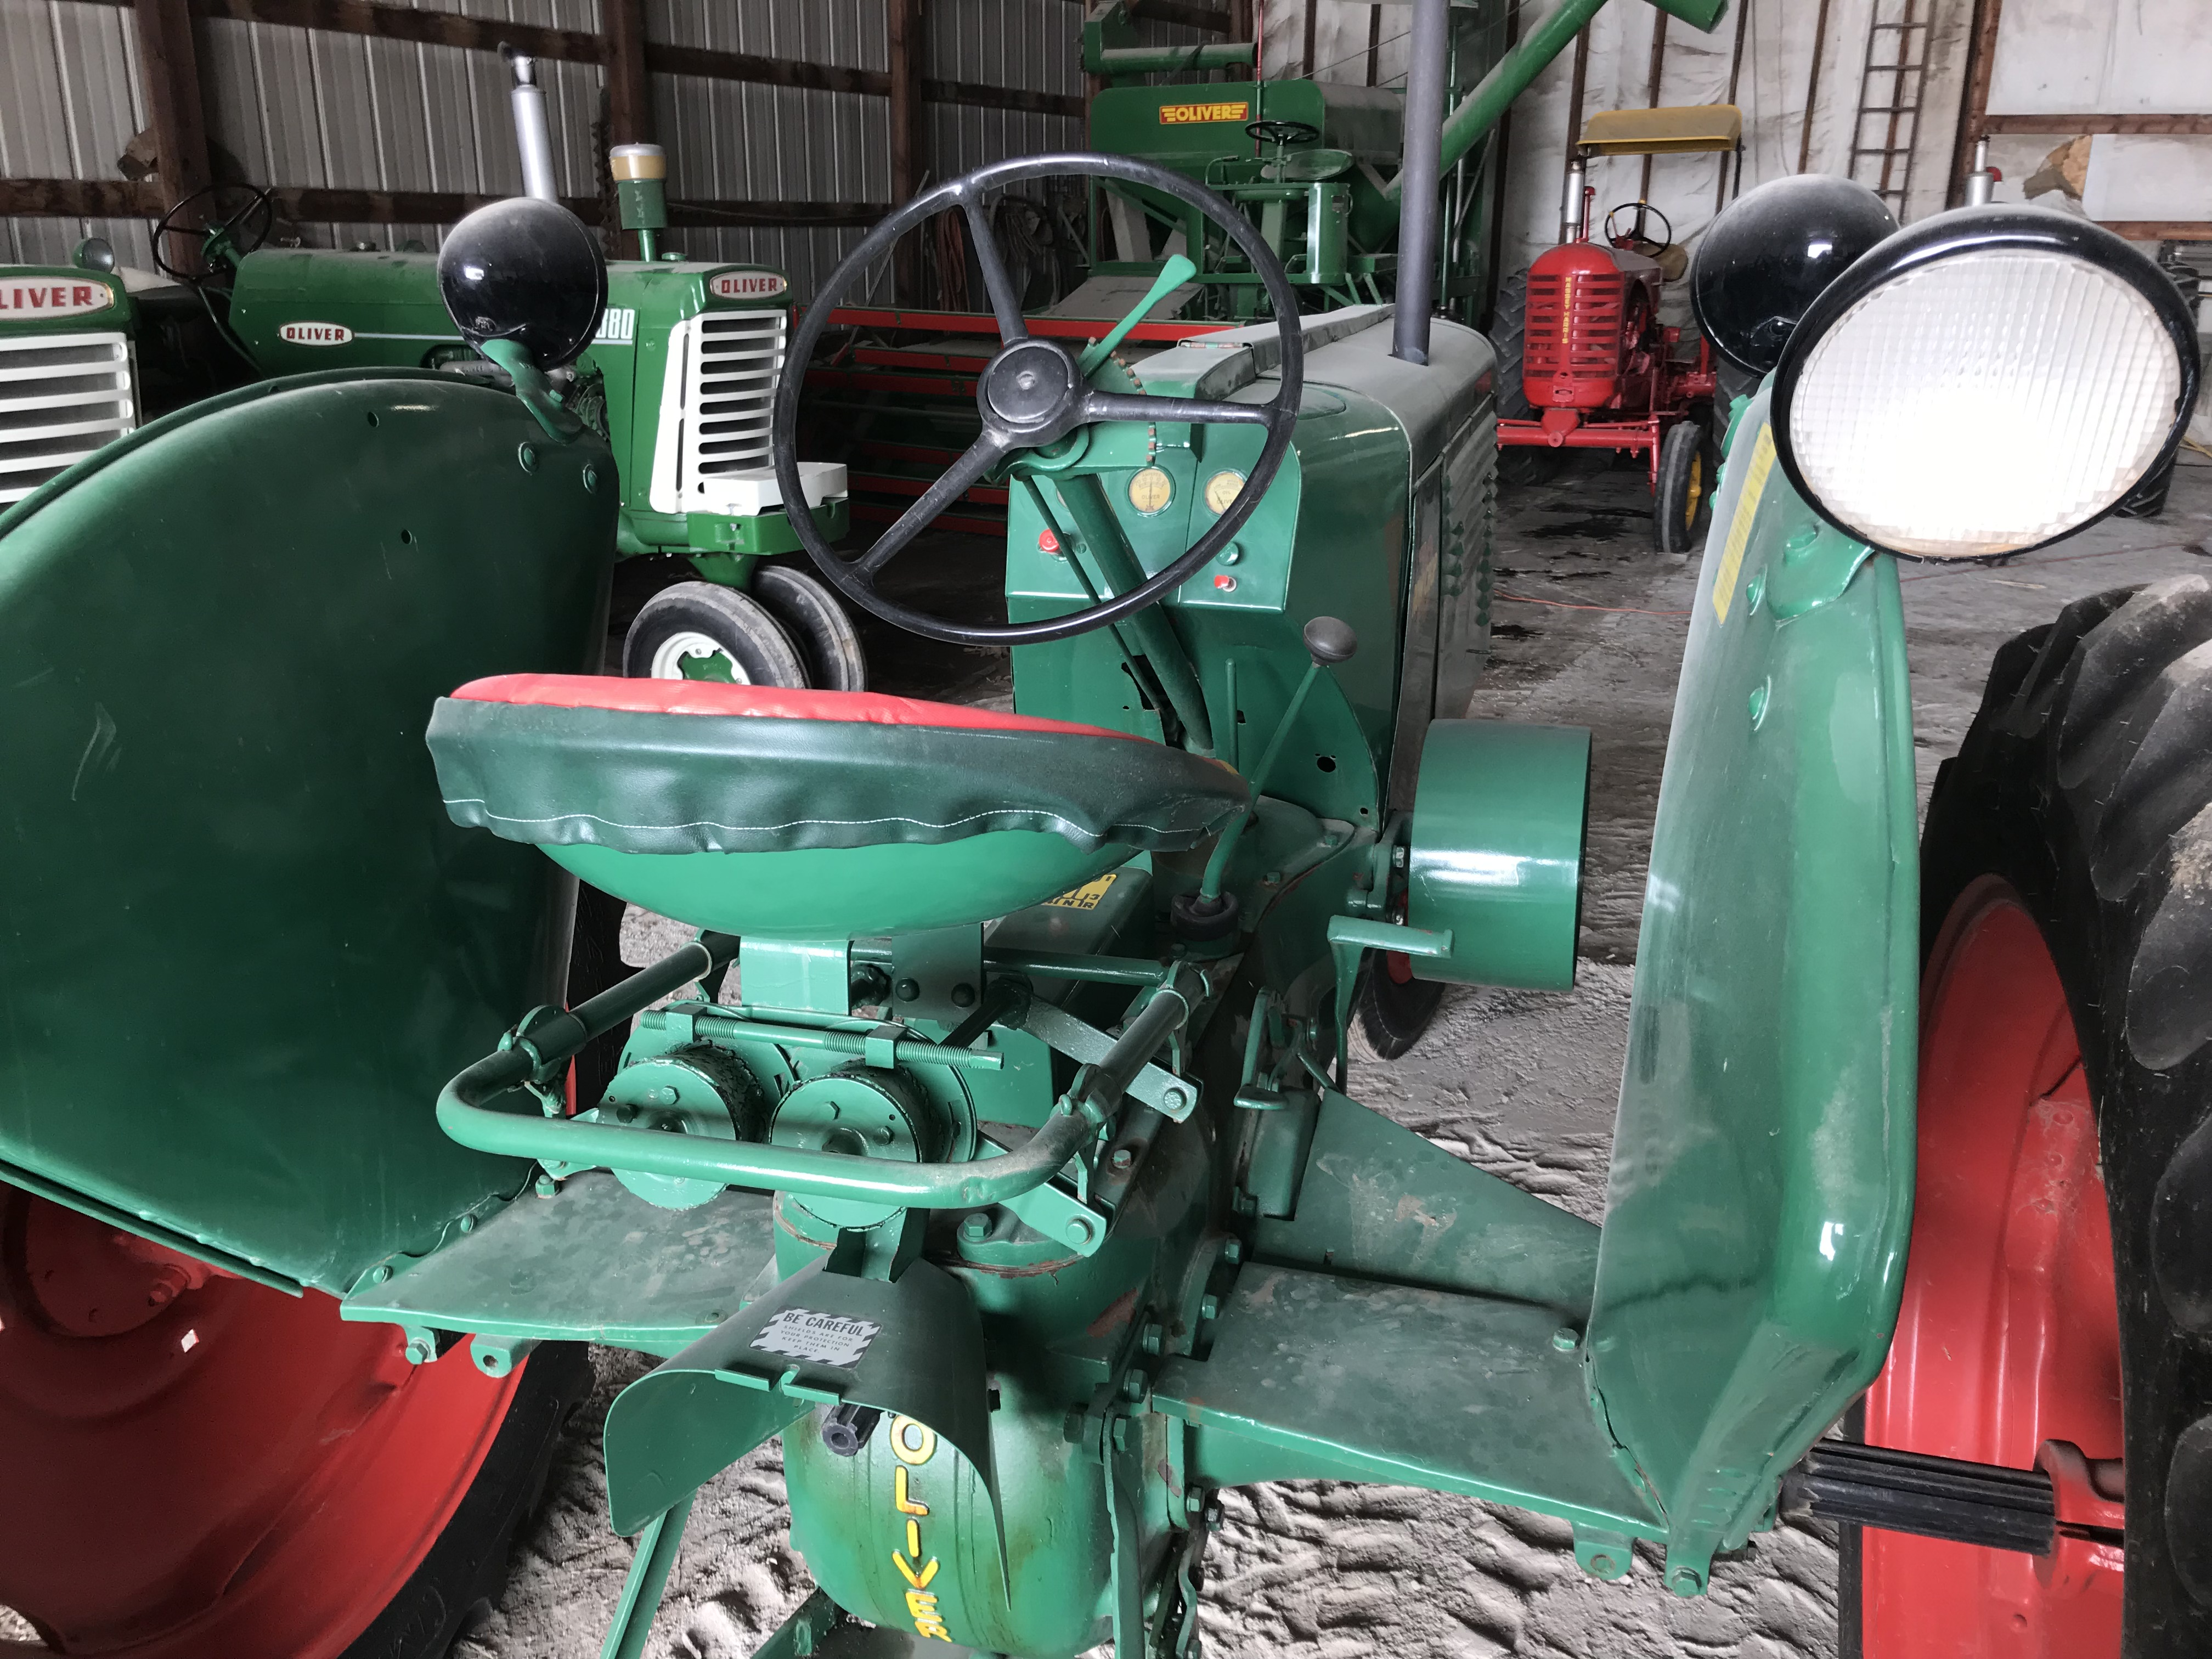 Lot 5 - Mdl.70 S#245239, Row Crop, Single Front Wheel, 12.4x38 New Rubber (restored)